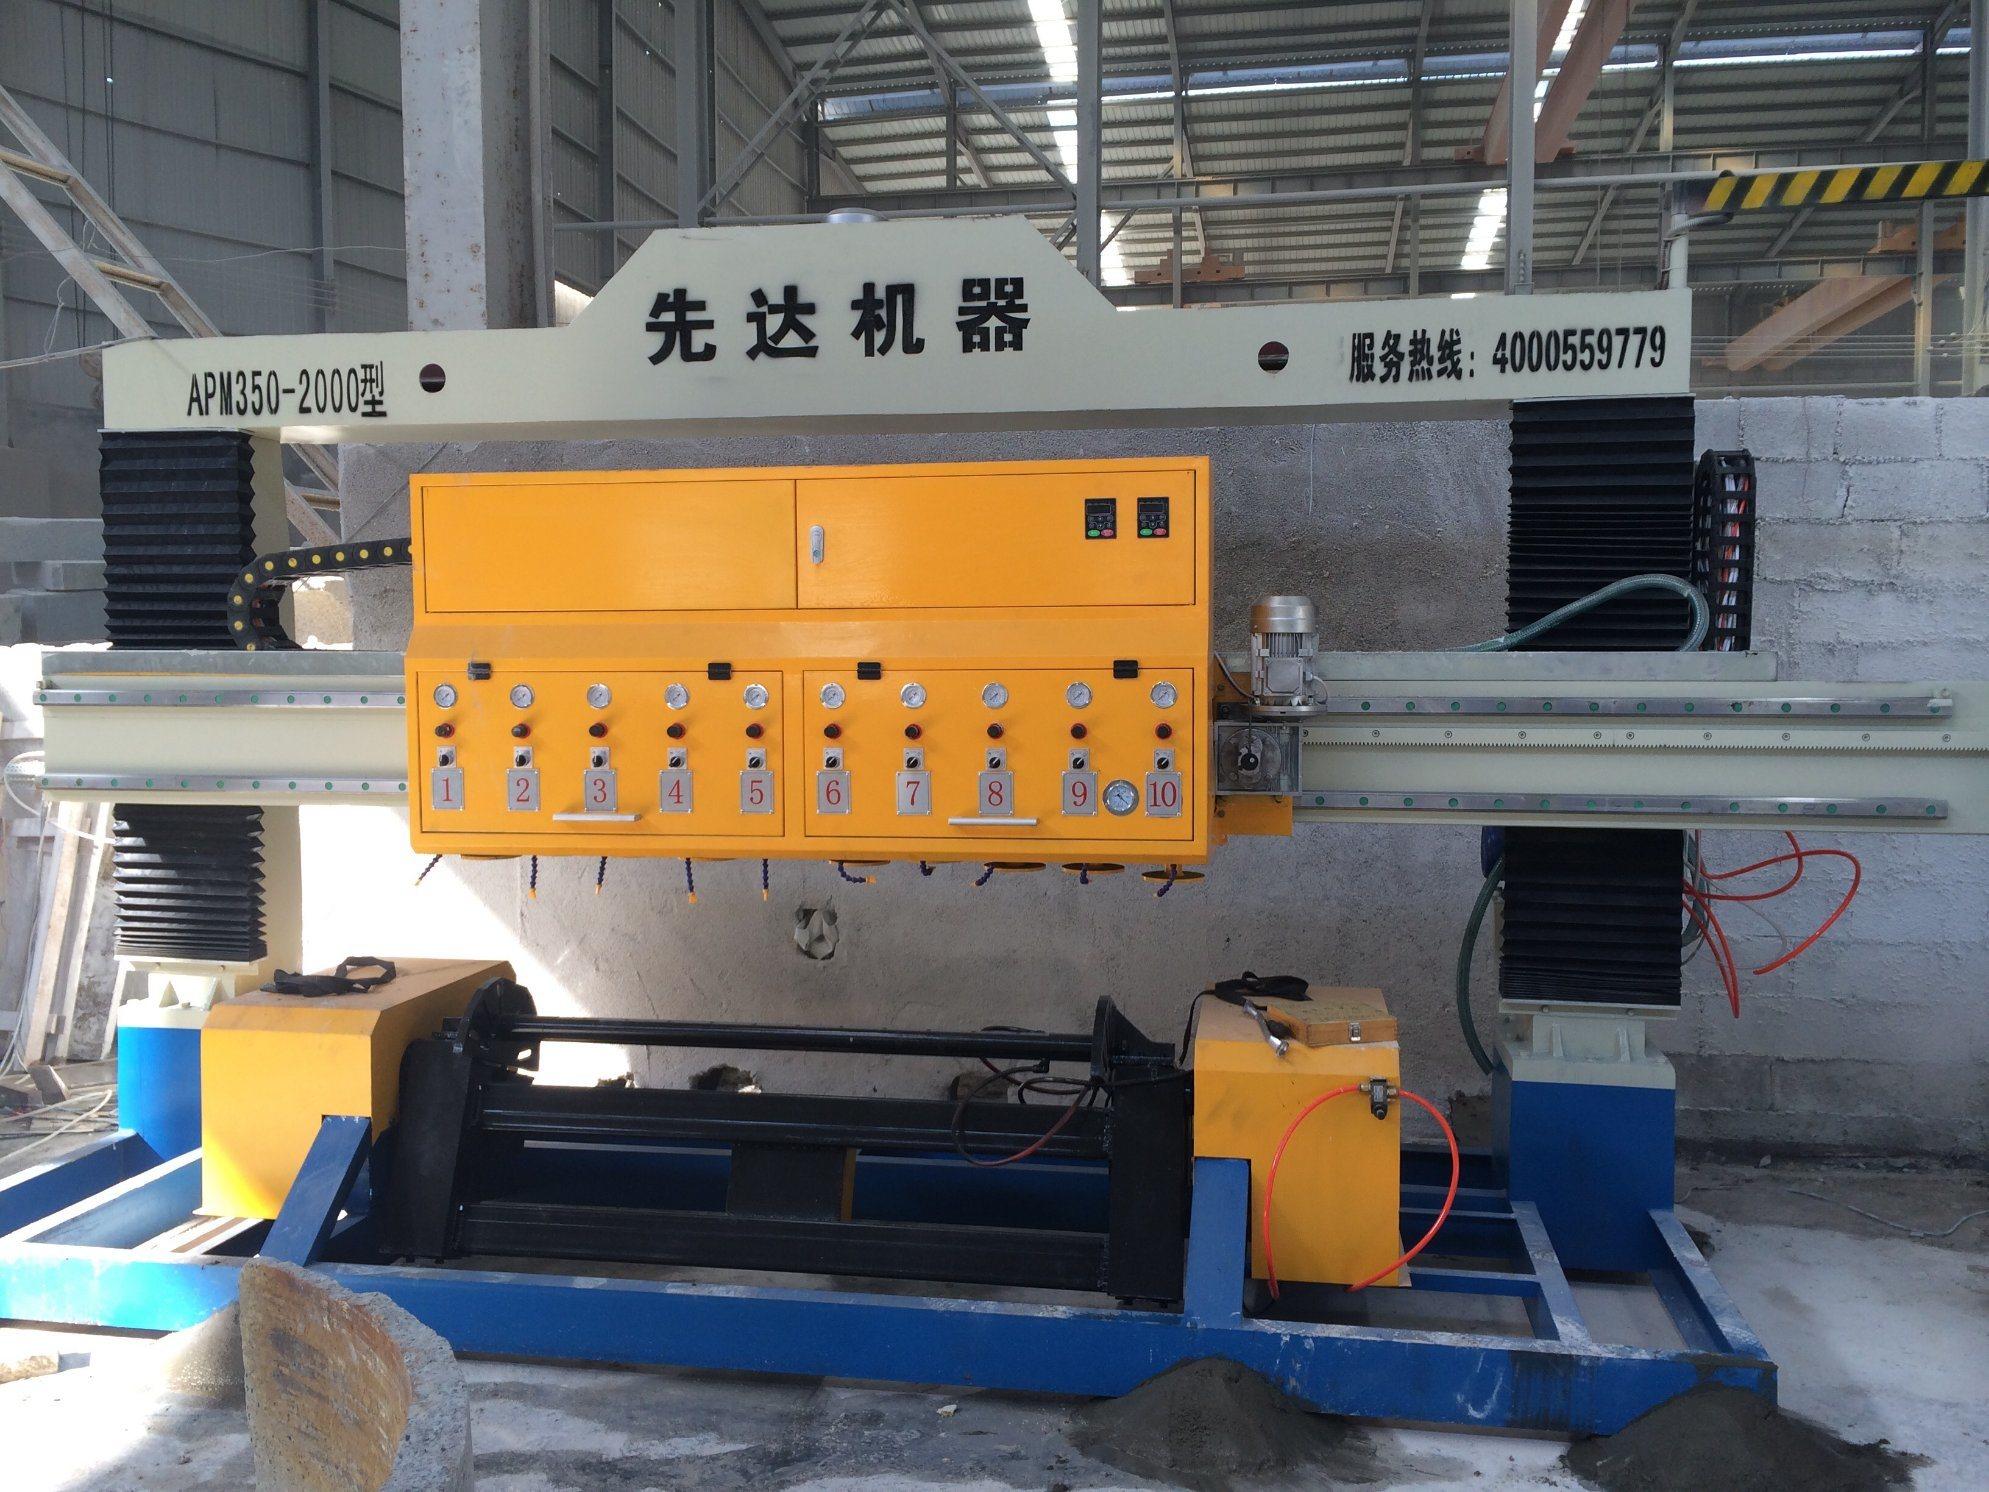 Apm-350-2000-12 Mable Granite Stone Cutting Machine for Column Polishing